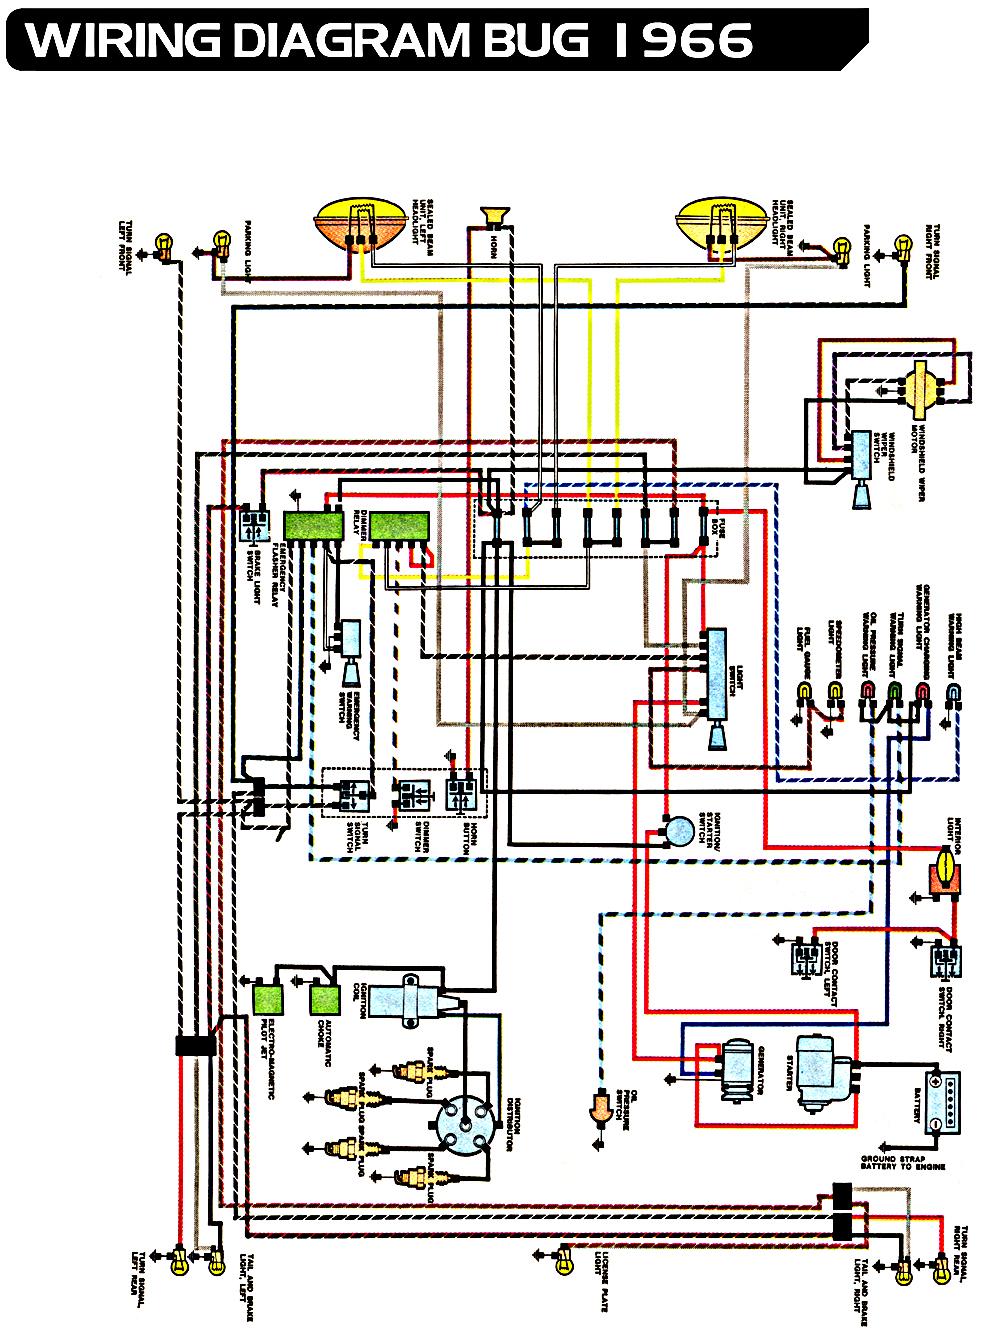 1973 Vw Super Beetle Engine Wiring Diagram - Wiring Diagram